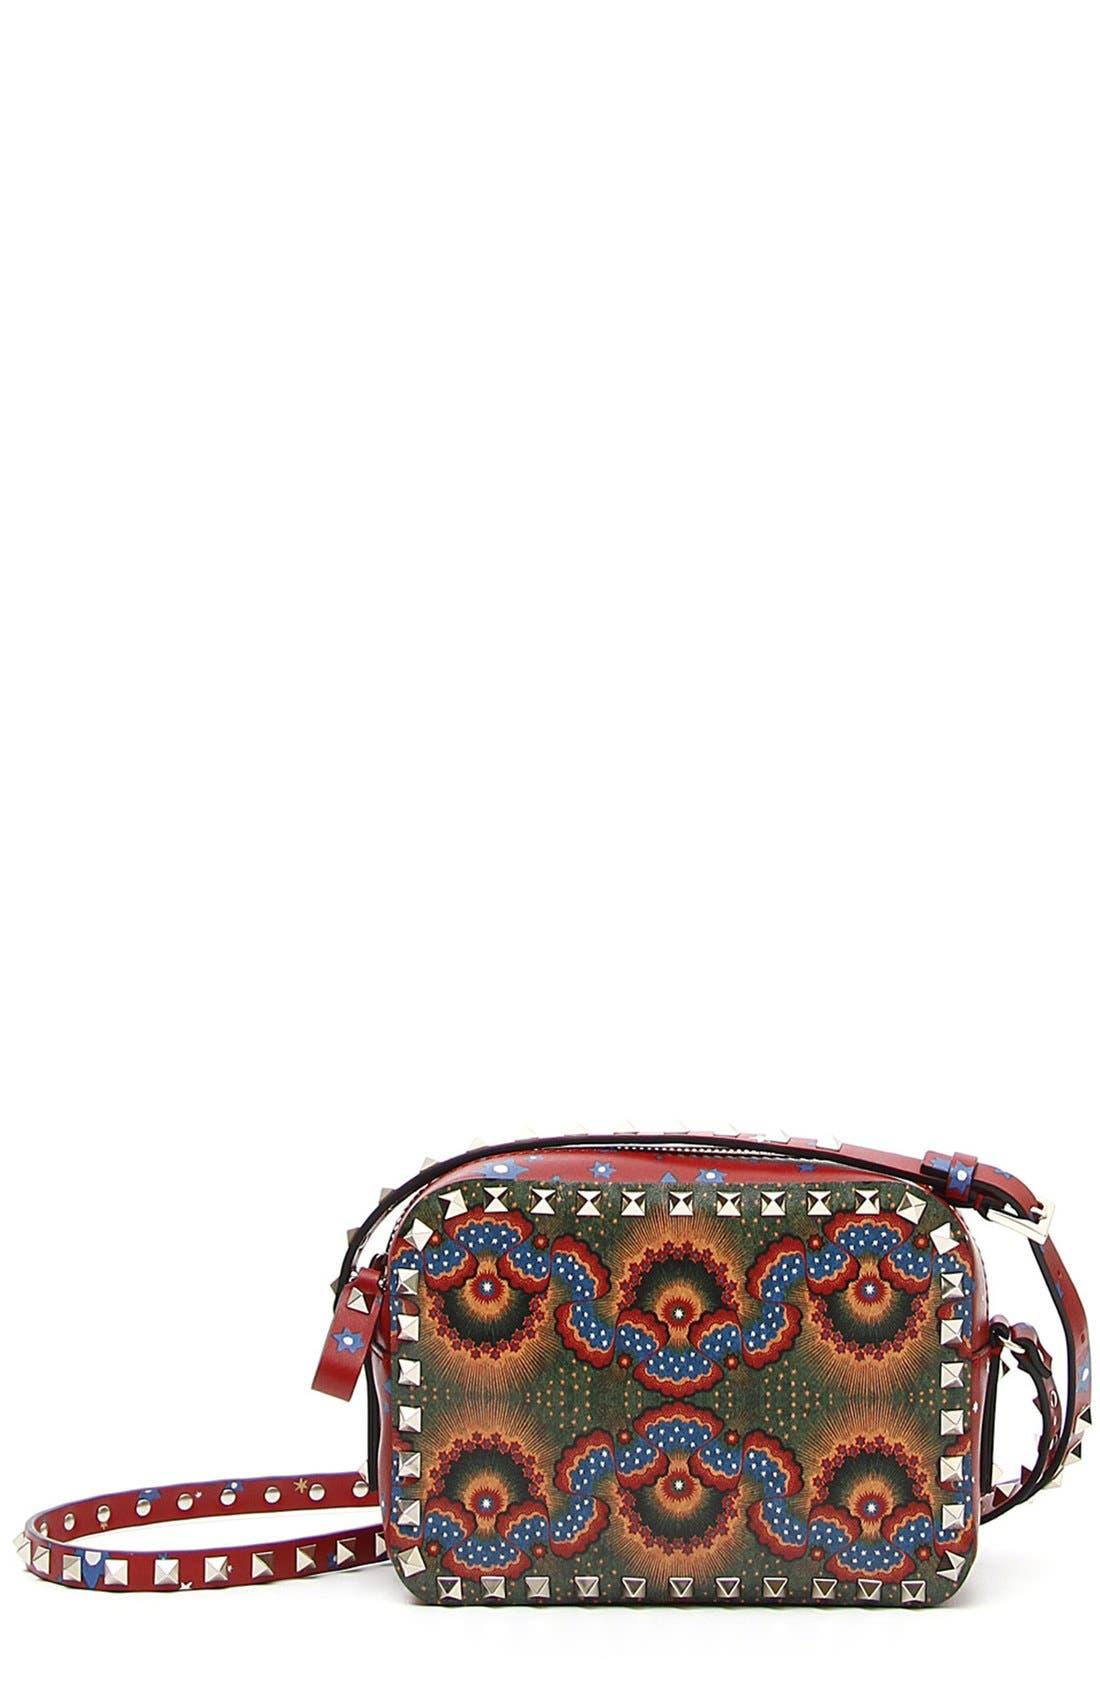 'Rockstud - Enchanted Wonderland' Calfskin Leather Camera Crossbody Bag,                             Main thumbnail 1, color,                             Rosso